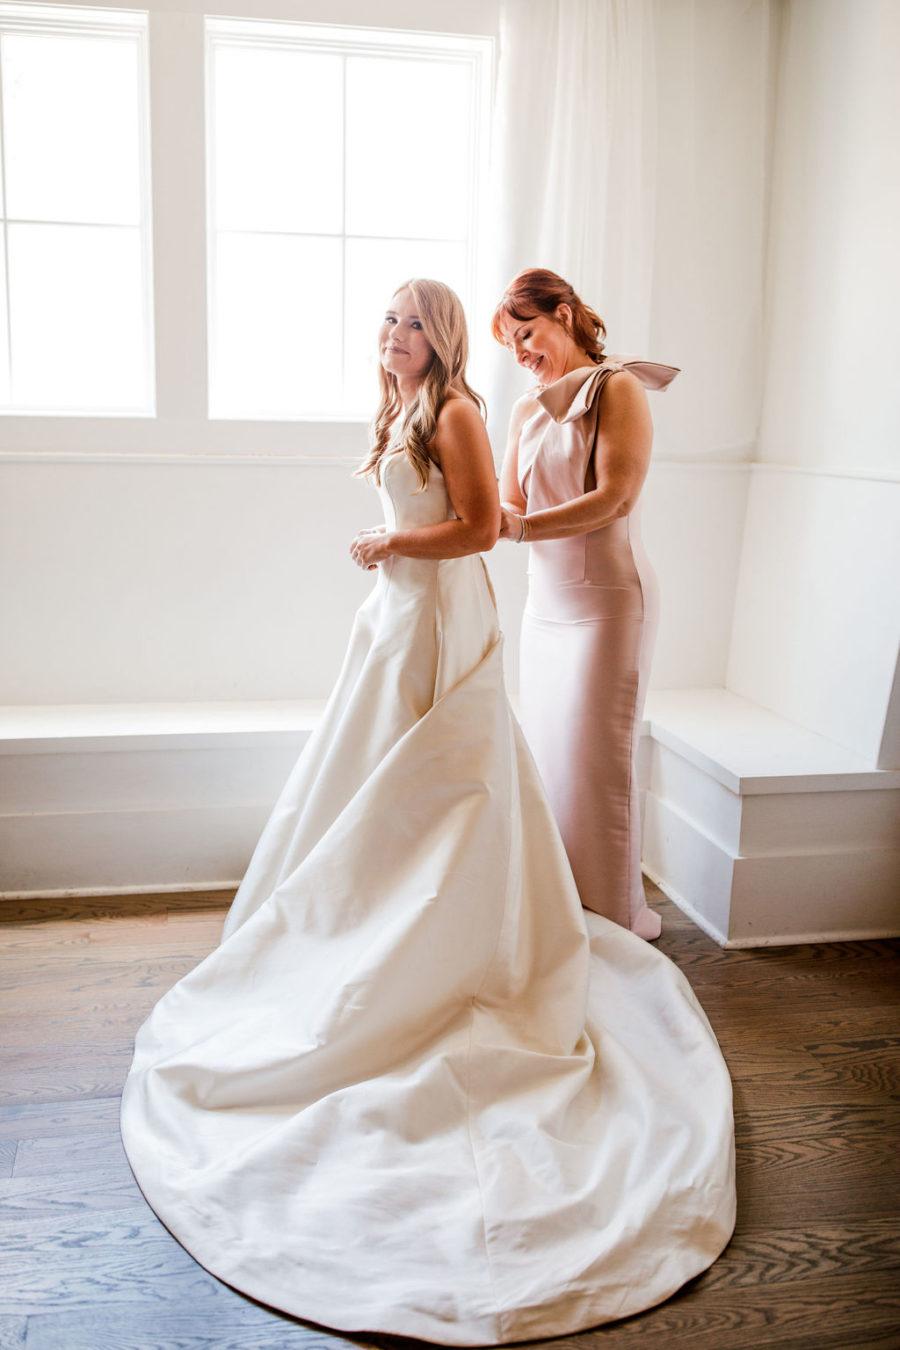 Satin Wedding Dress: Beautiful Graystone Quarry Wedding captured by John Myers Photography & Videography